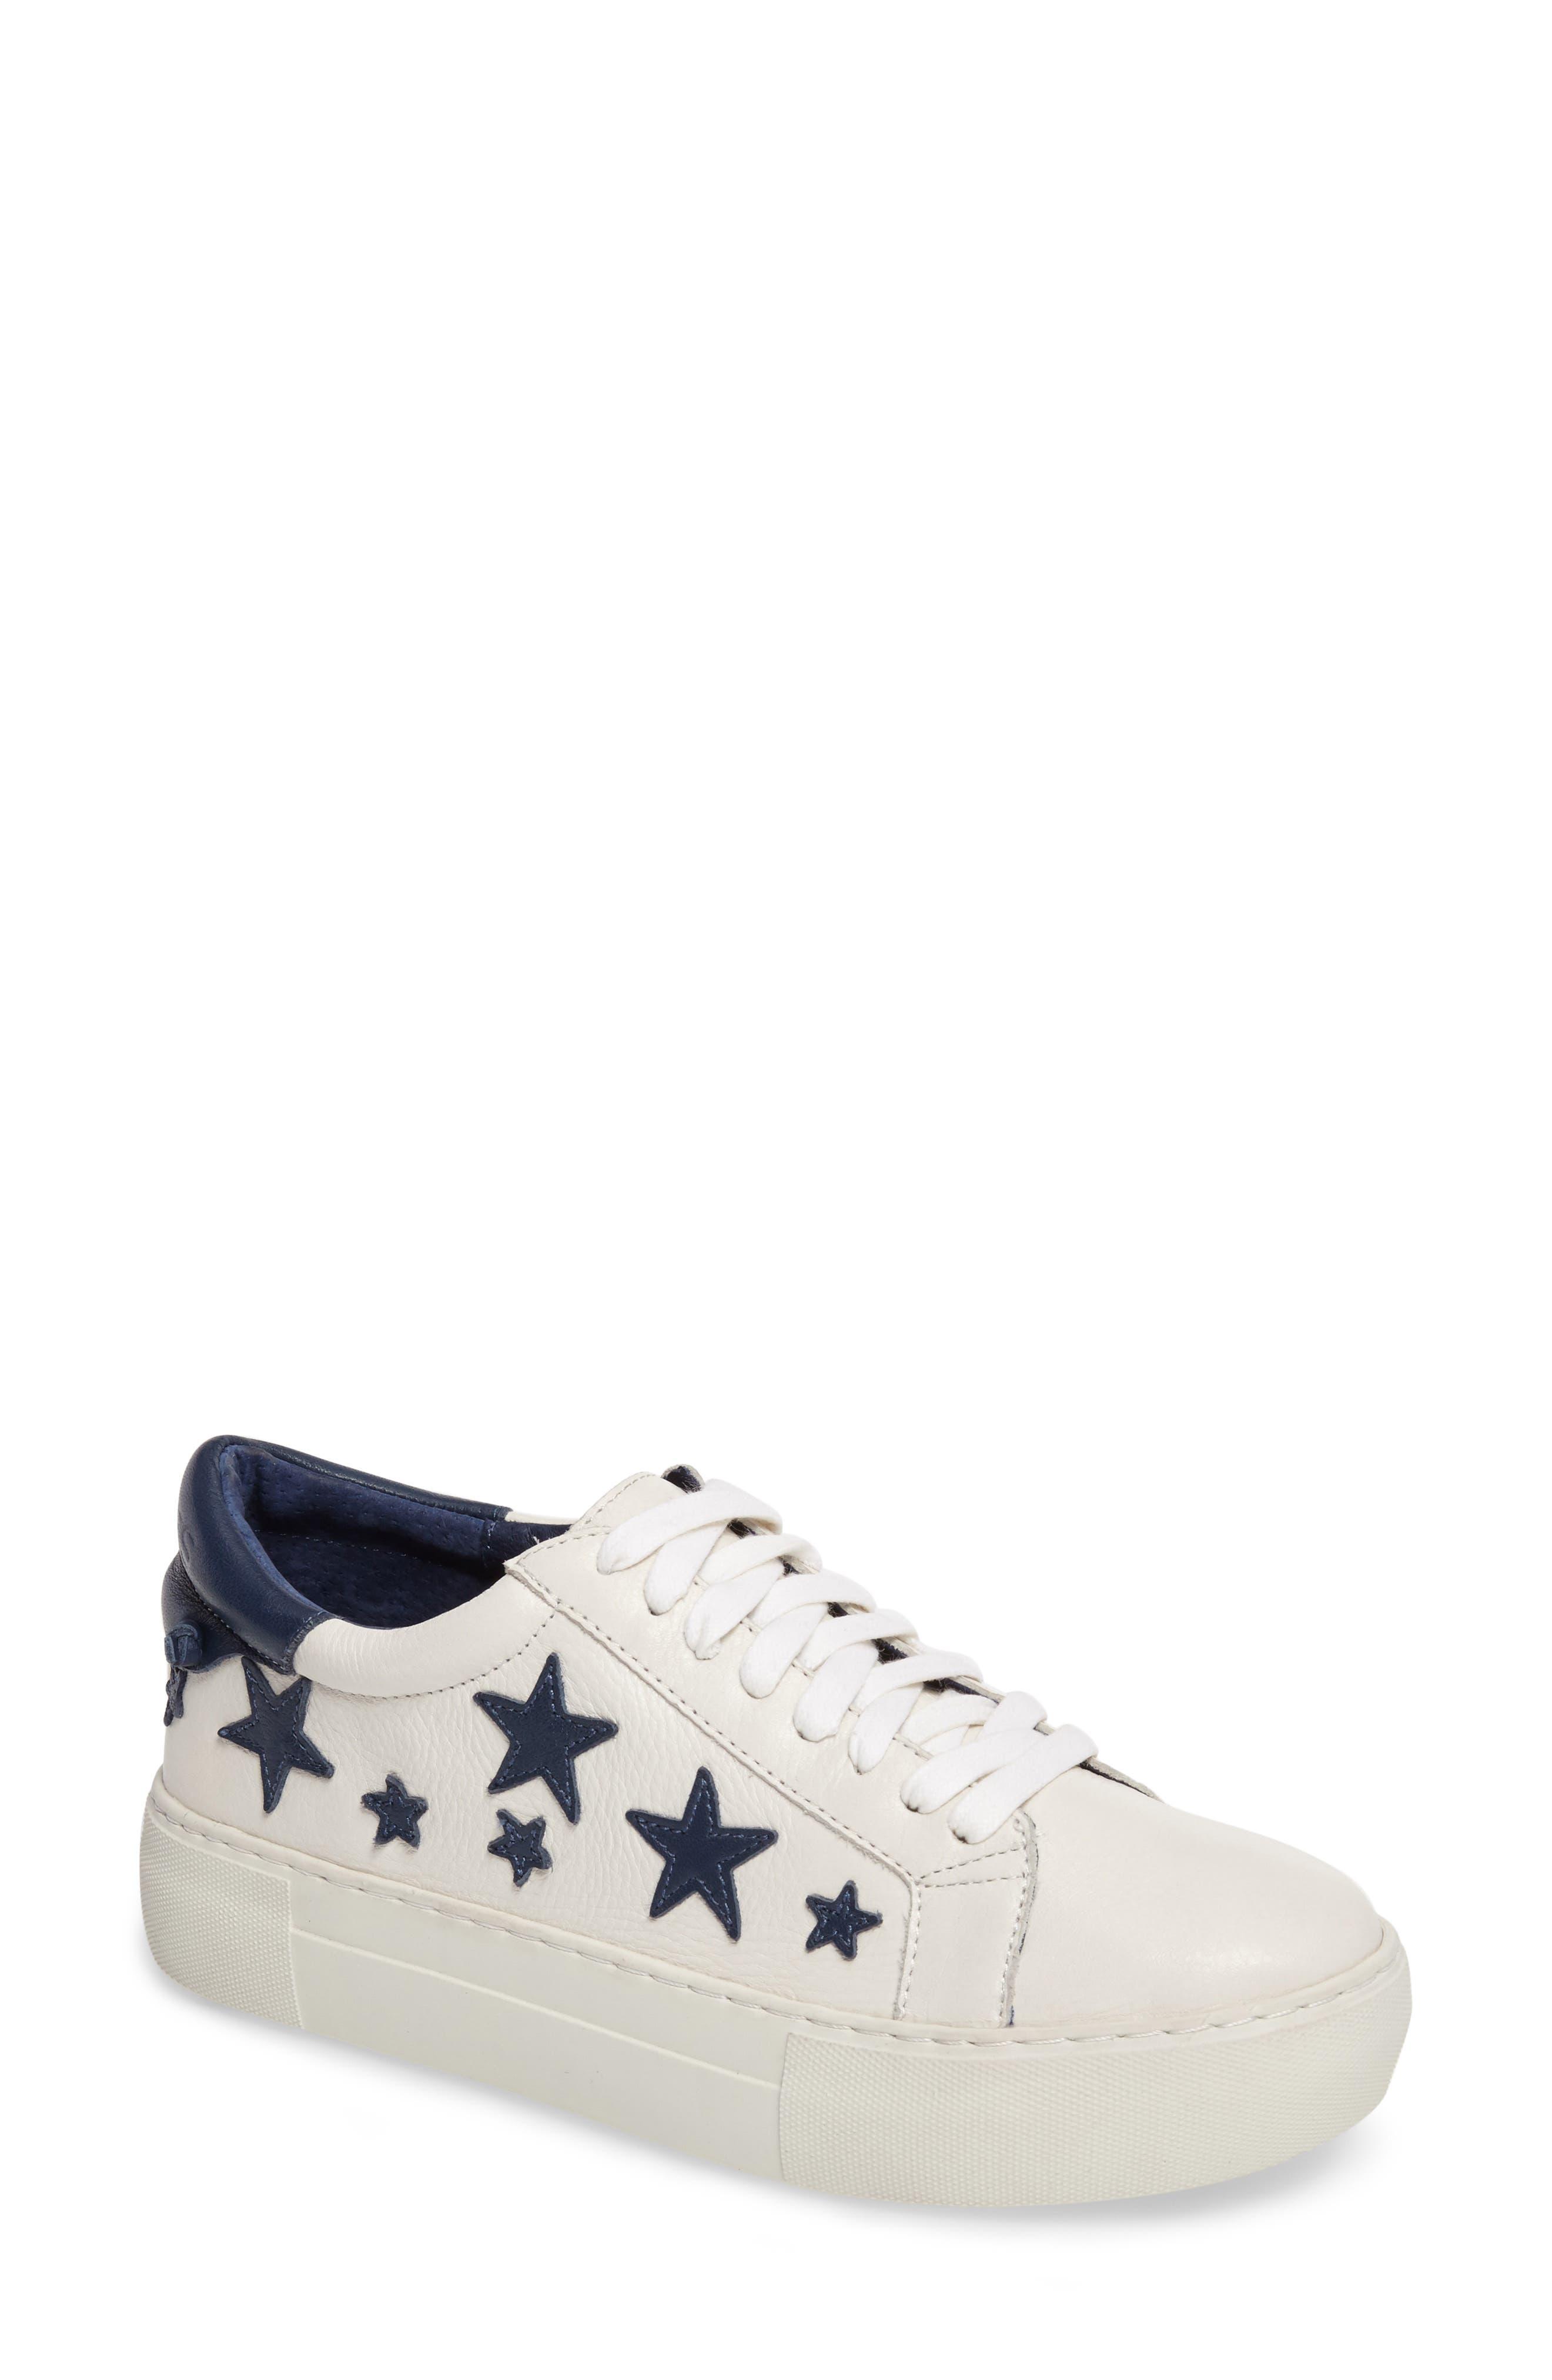 Alabama Sneaker,                         Main,                         color, 122